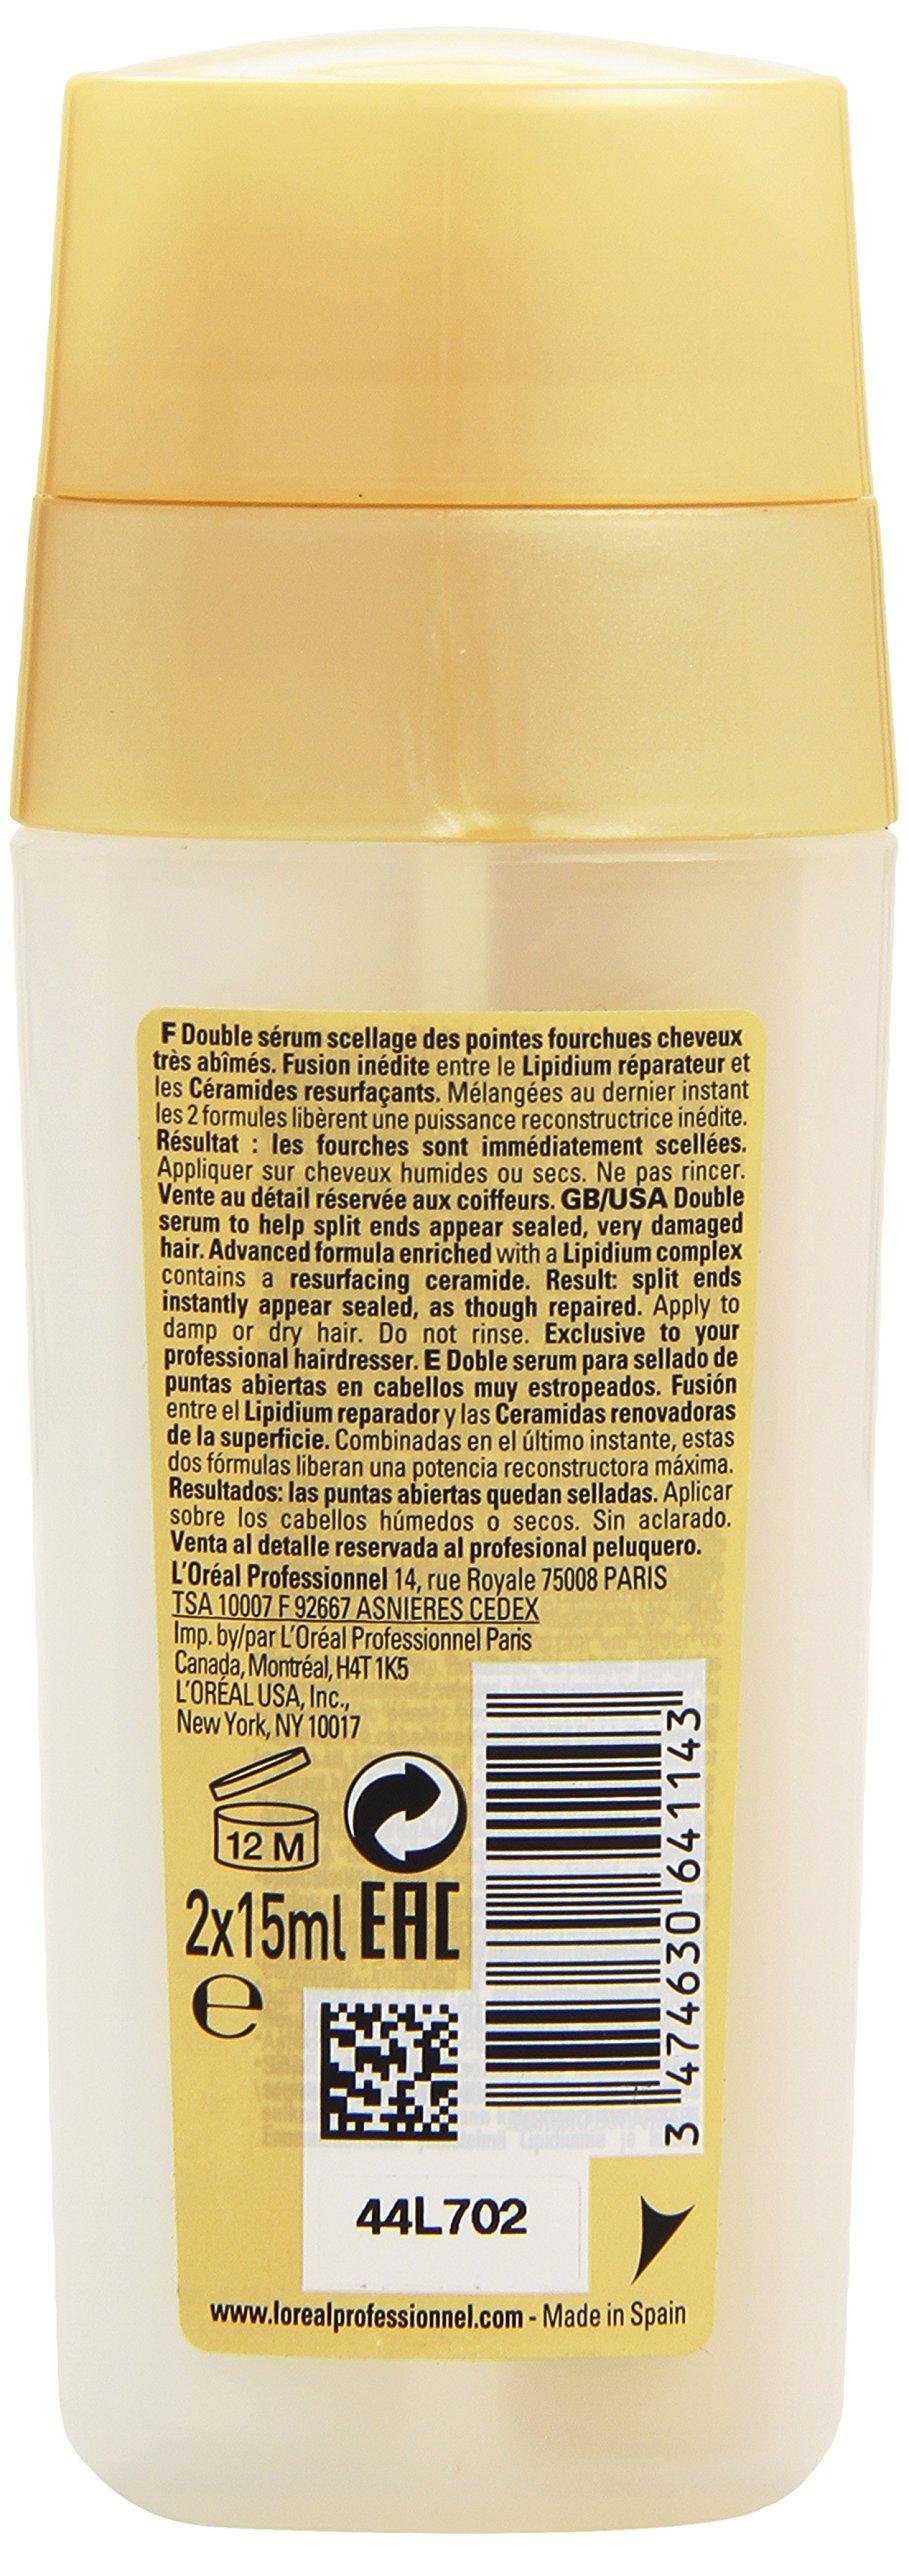 L'Oreal Professional Expert Serie Sealing Repair Lipidium Double Serum, 0.5 Ounce by L'Oreal Paris (Image #2)